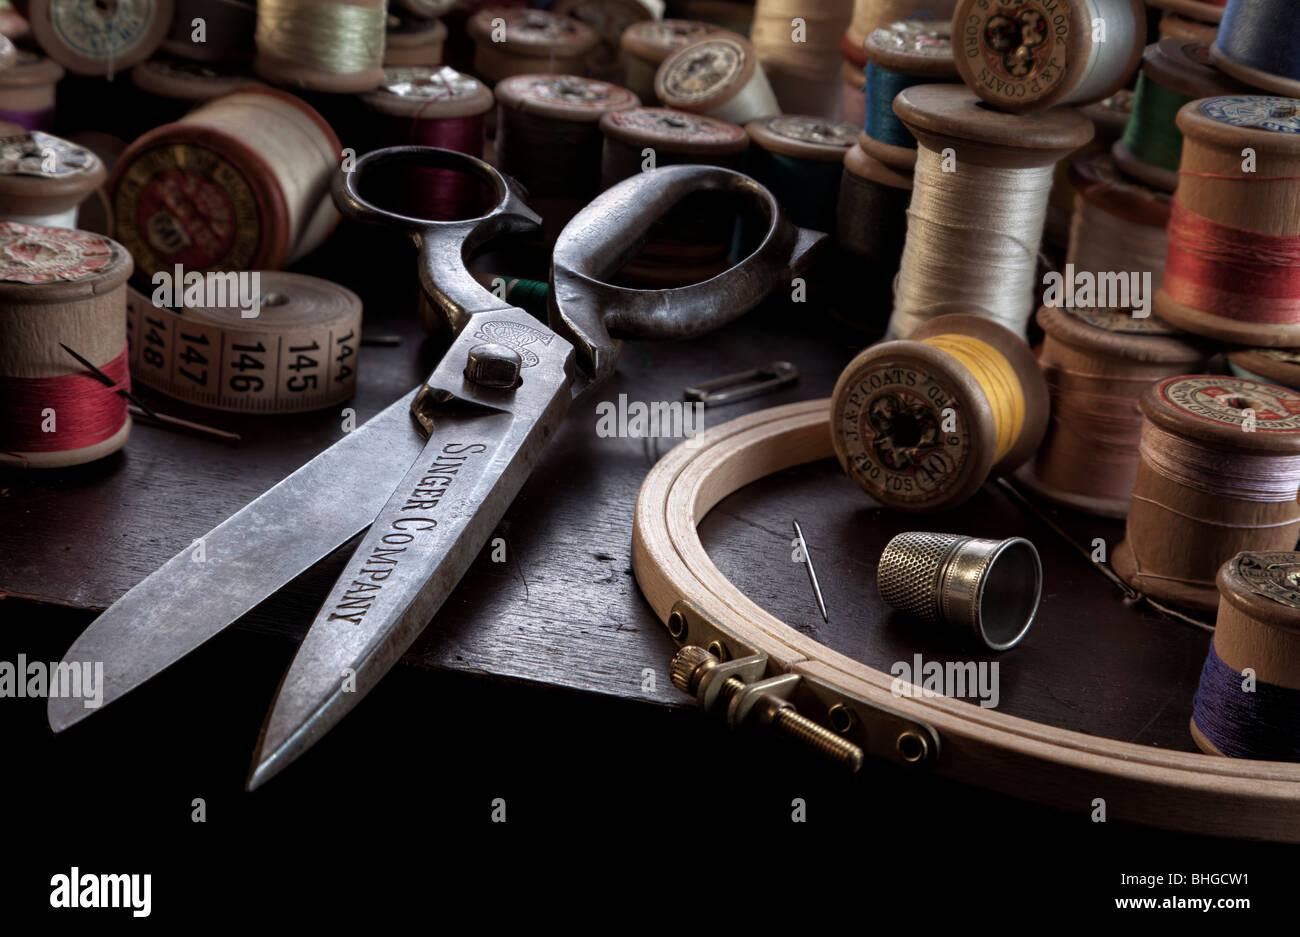 Vintage sewing scene still life - Stock Image